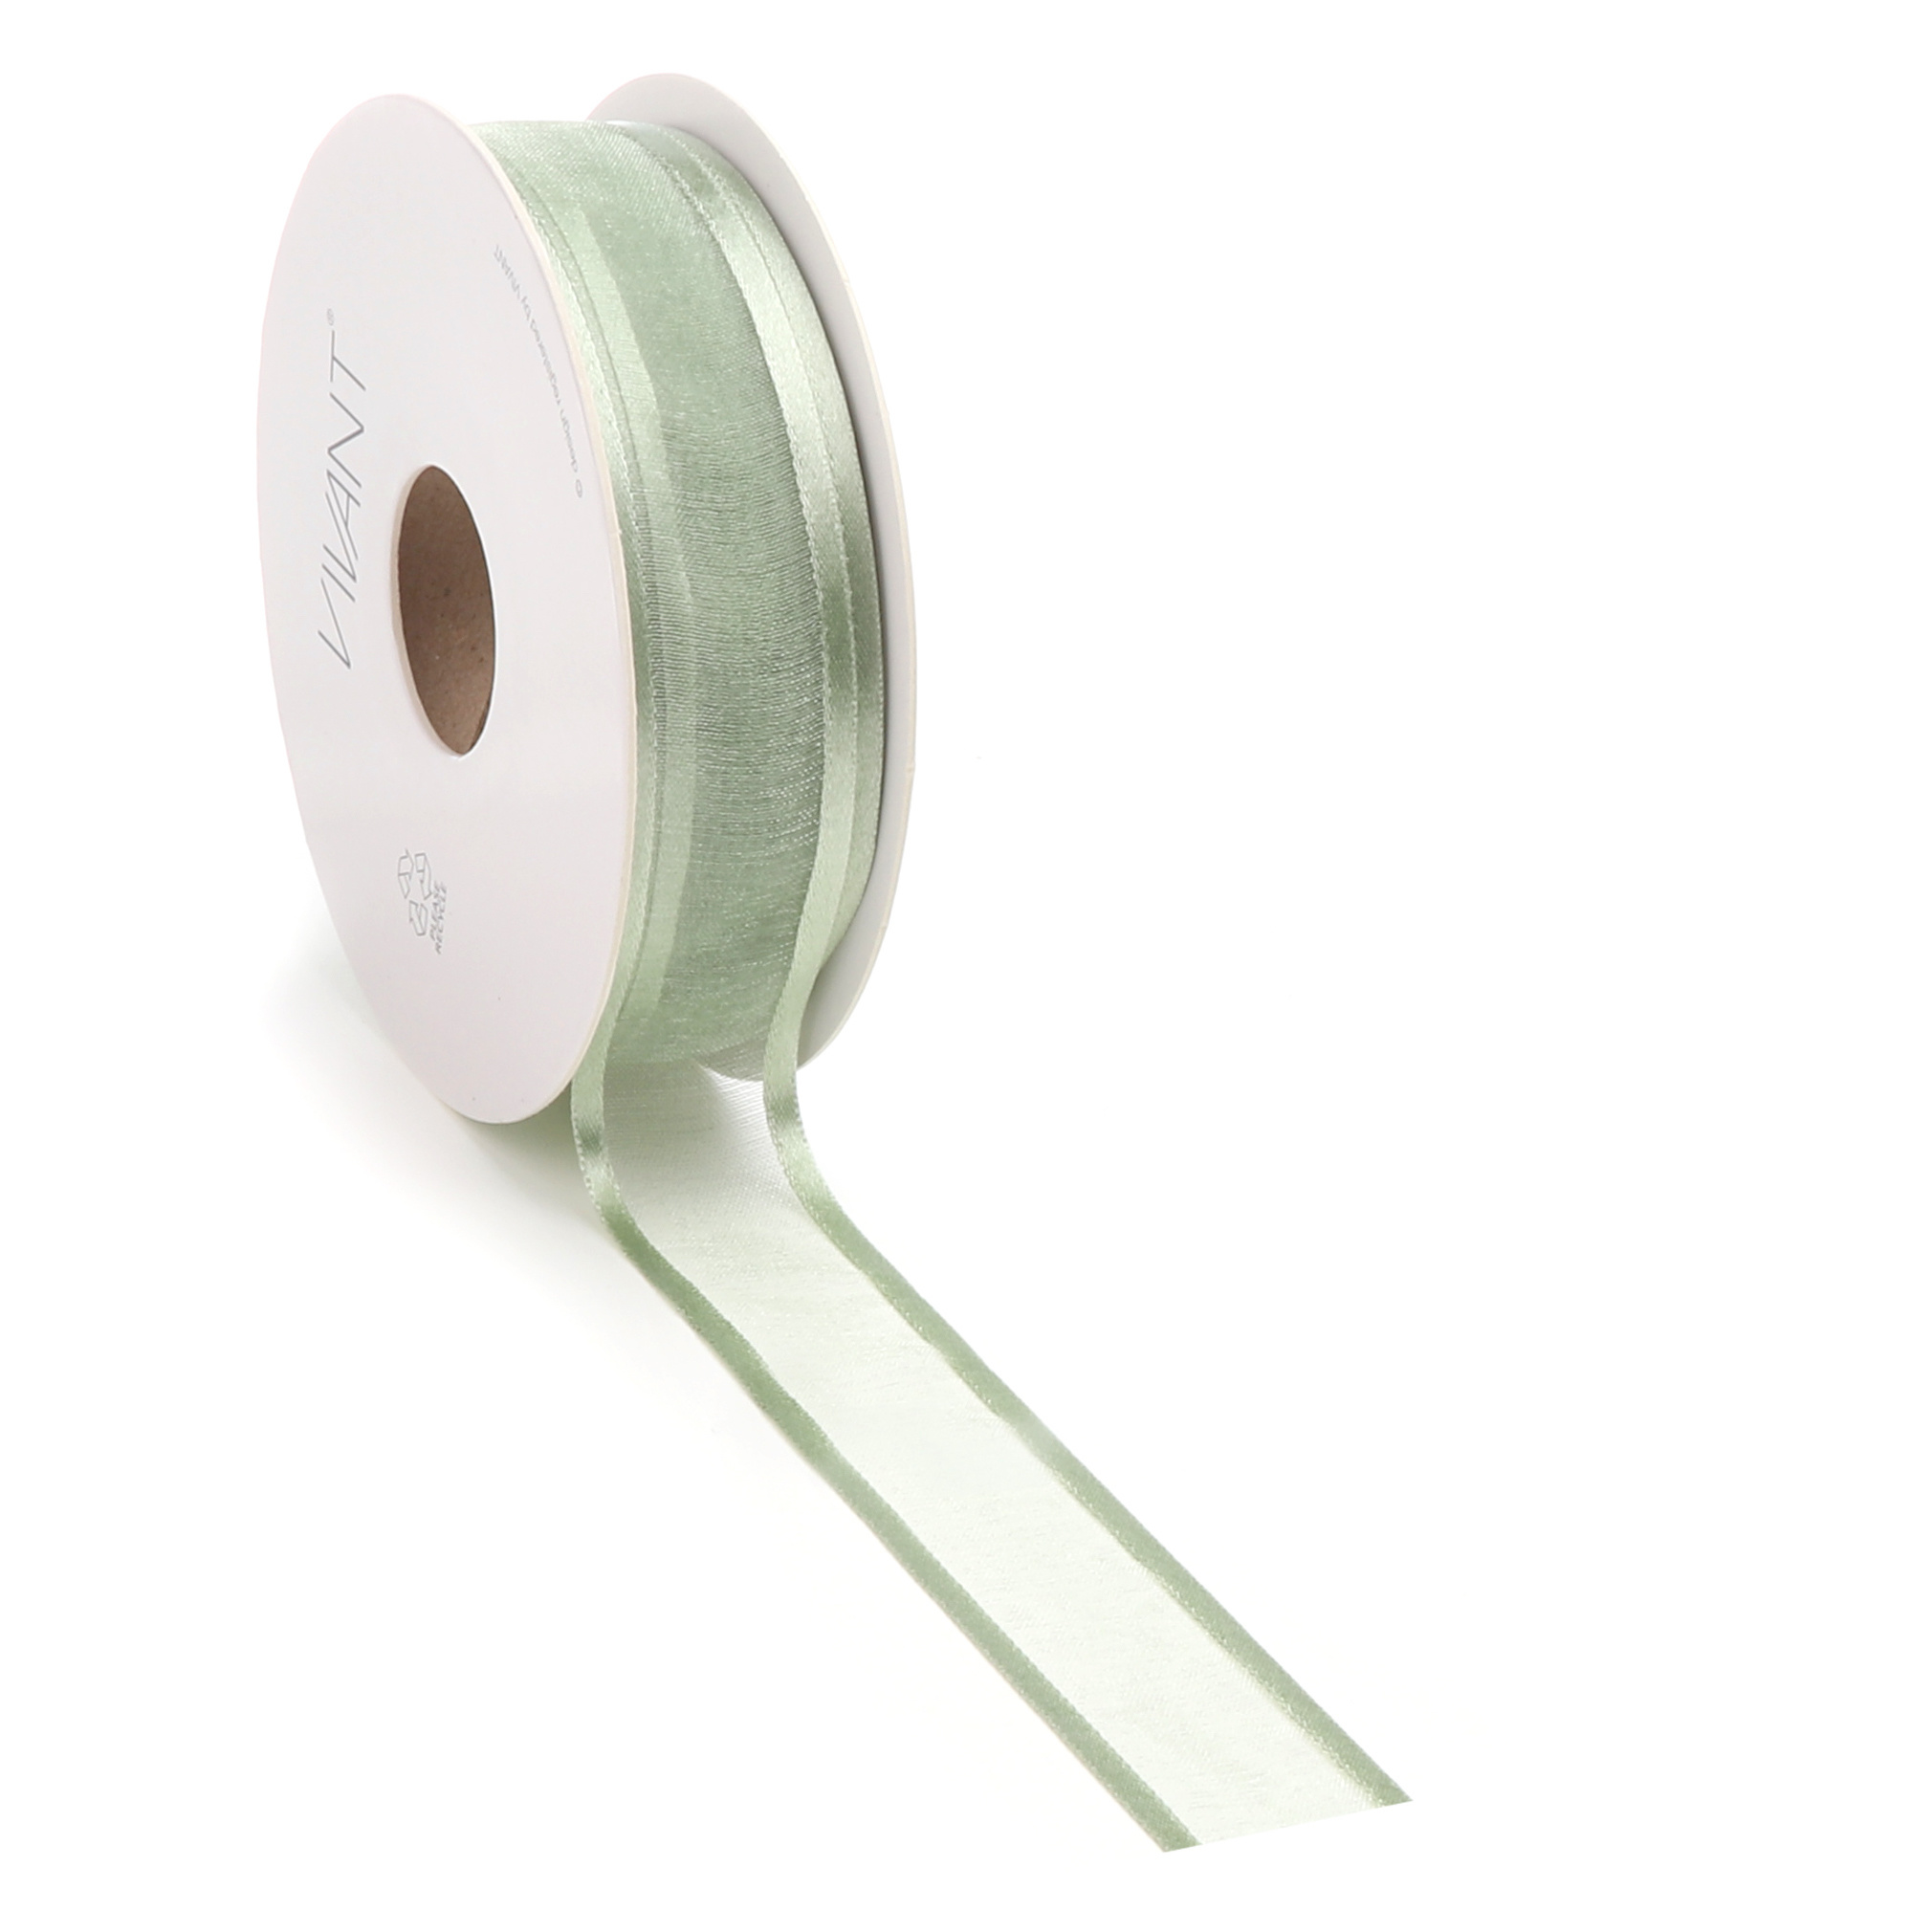 Prego woven edge Band - Light Olive